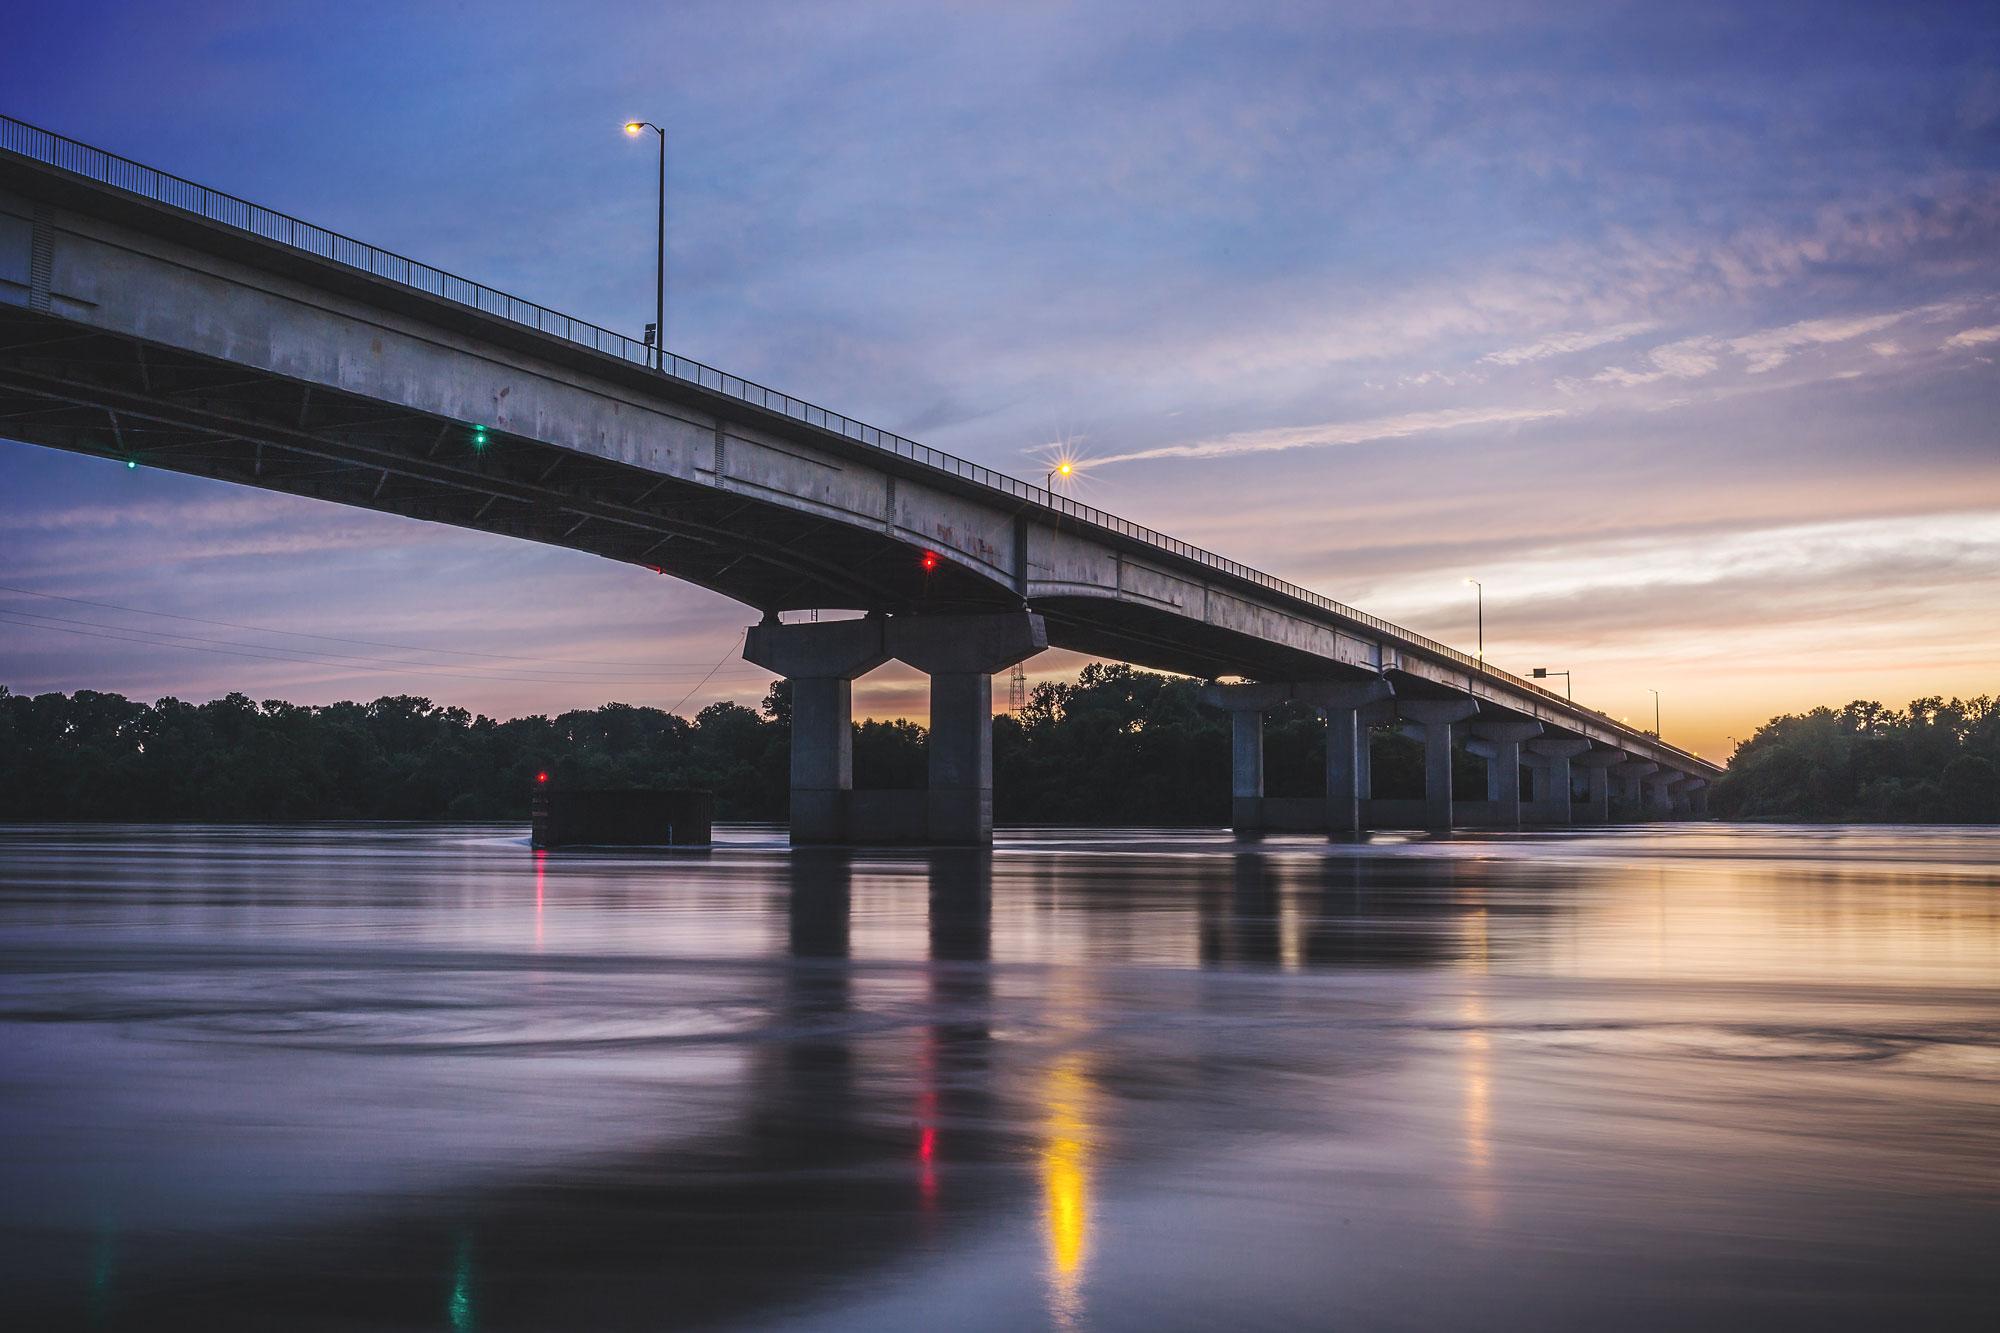 midwest bridge dusk industrial